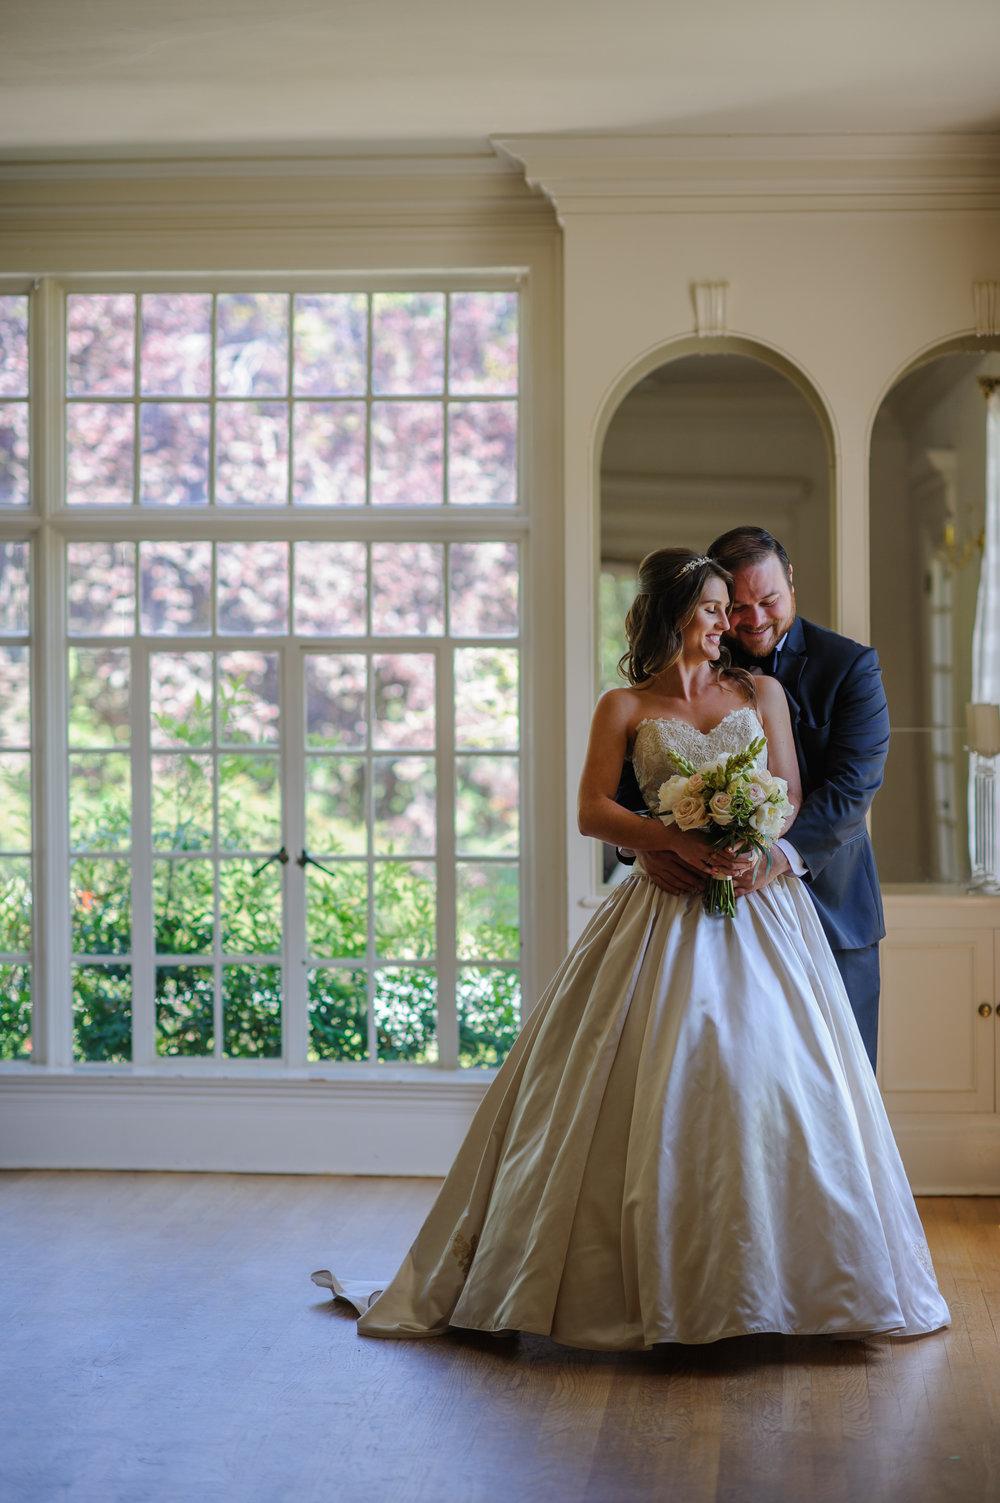 lindsey-charlie-049-monte-verde-inn-foresthill-wedding-photographer-katherine-nicole-photography.JPG